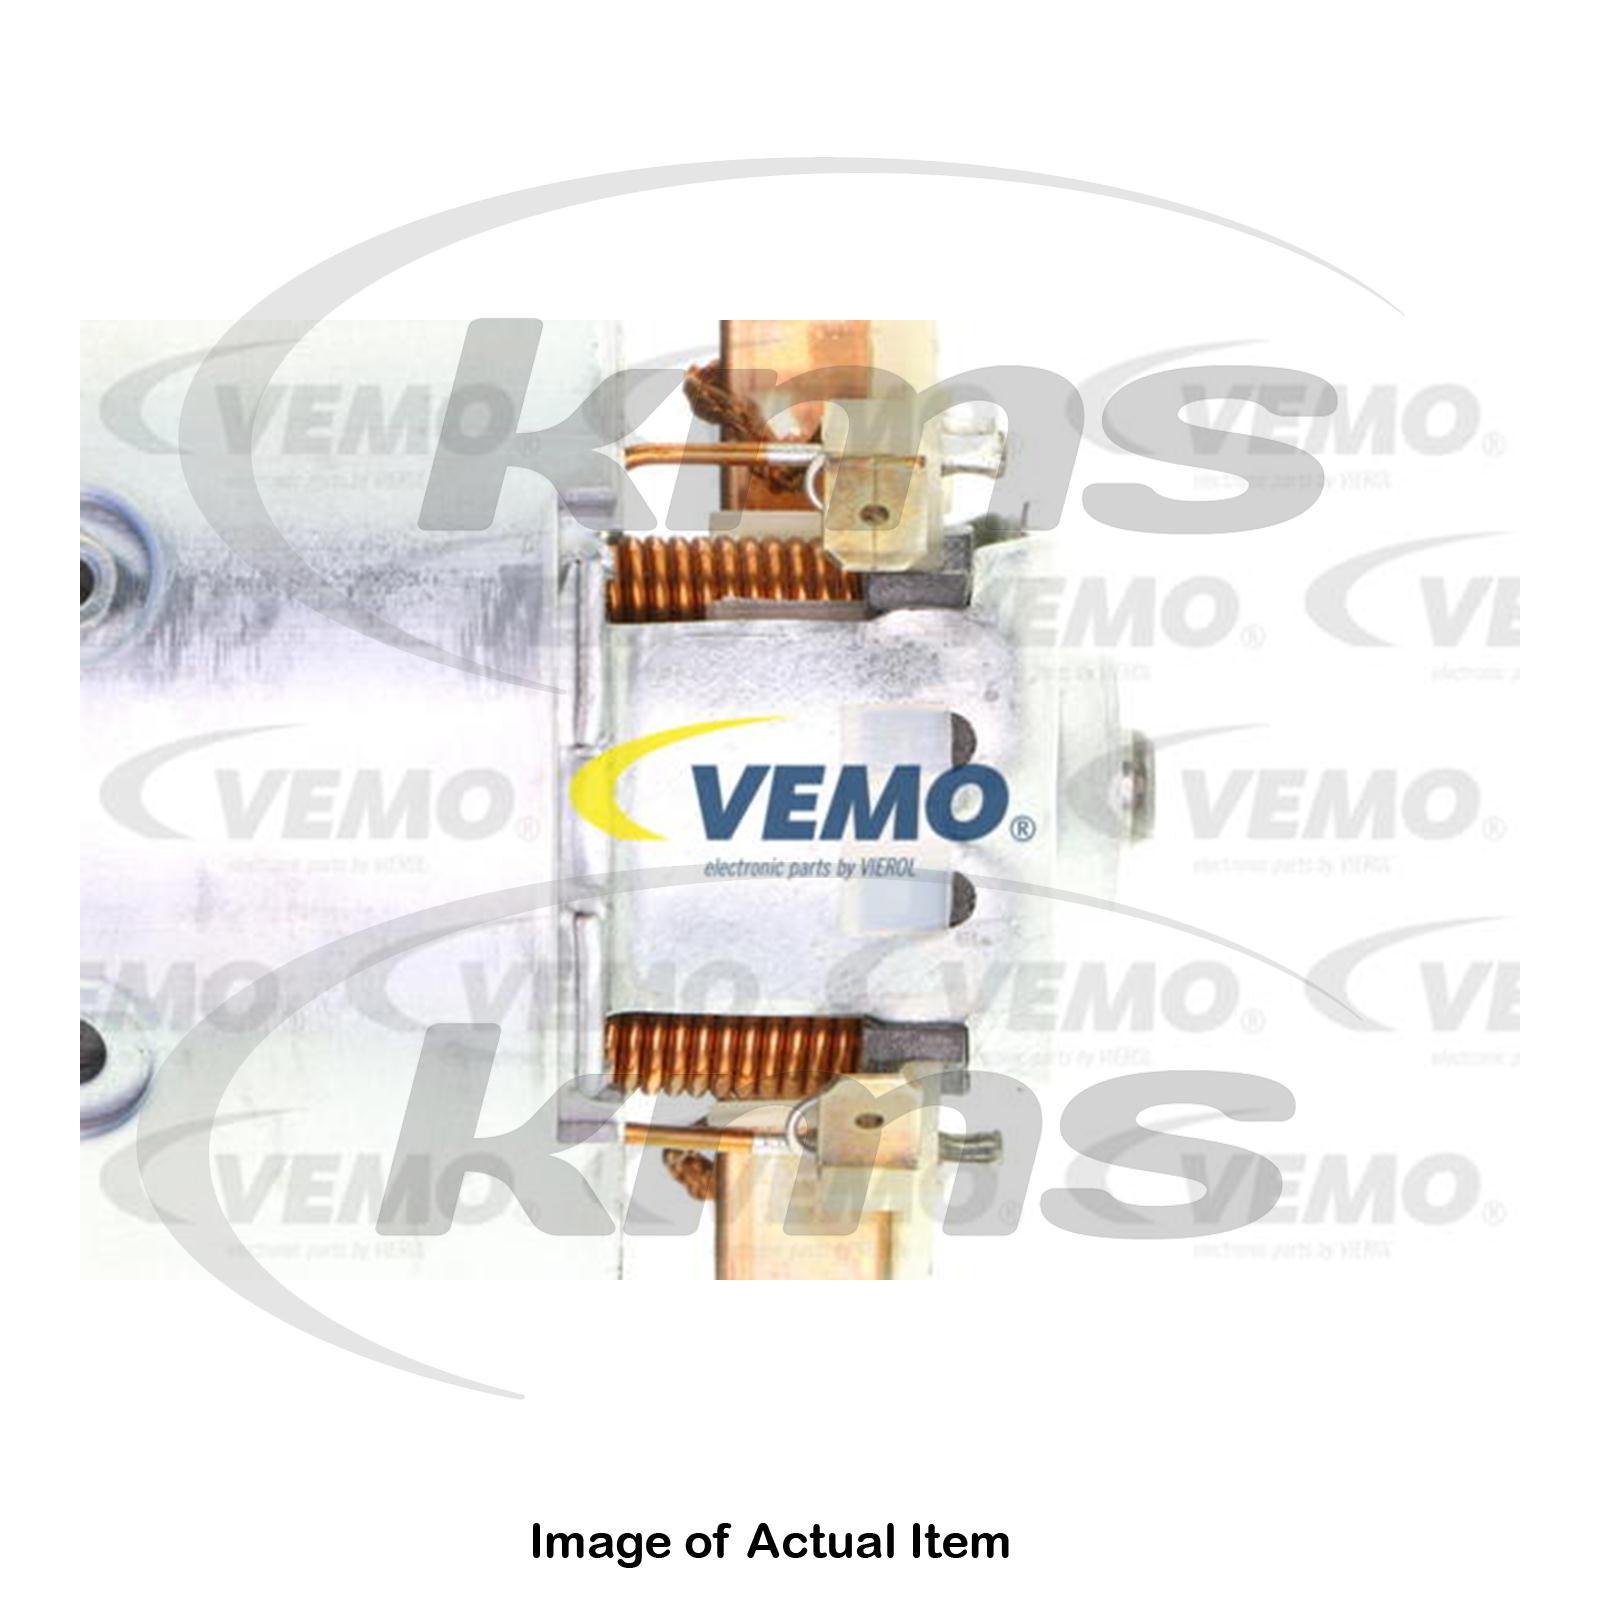 New VEM Interior Heater Blower Motor  V95-03-1362 Top German Quality